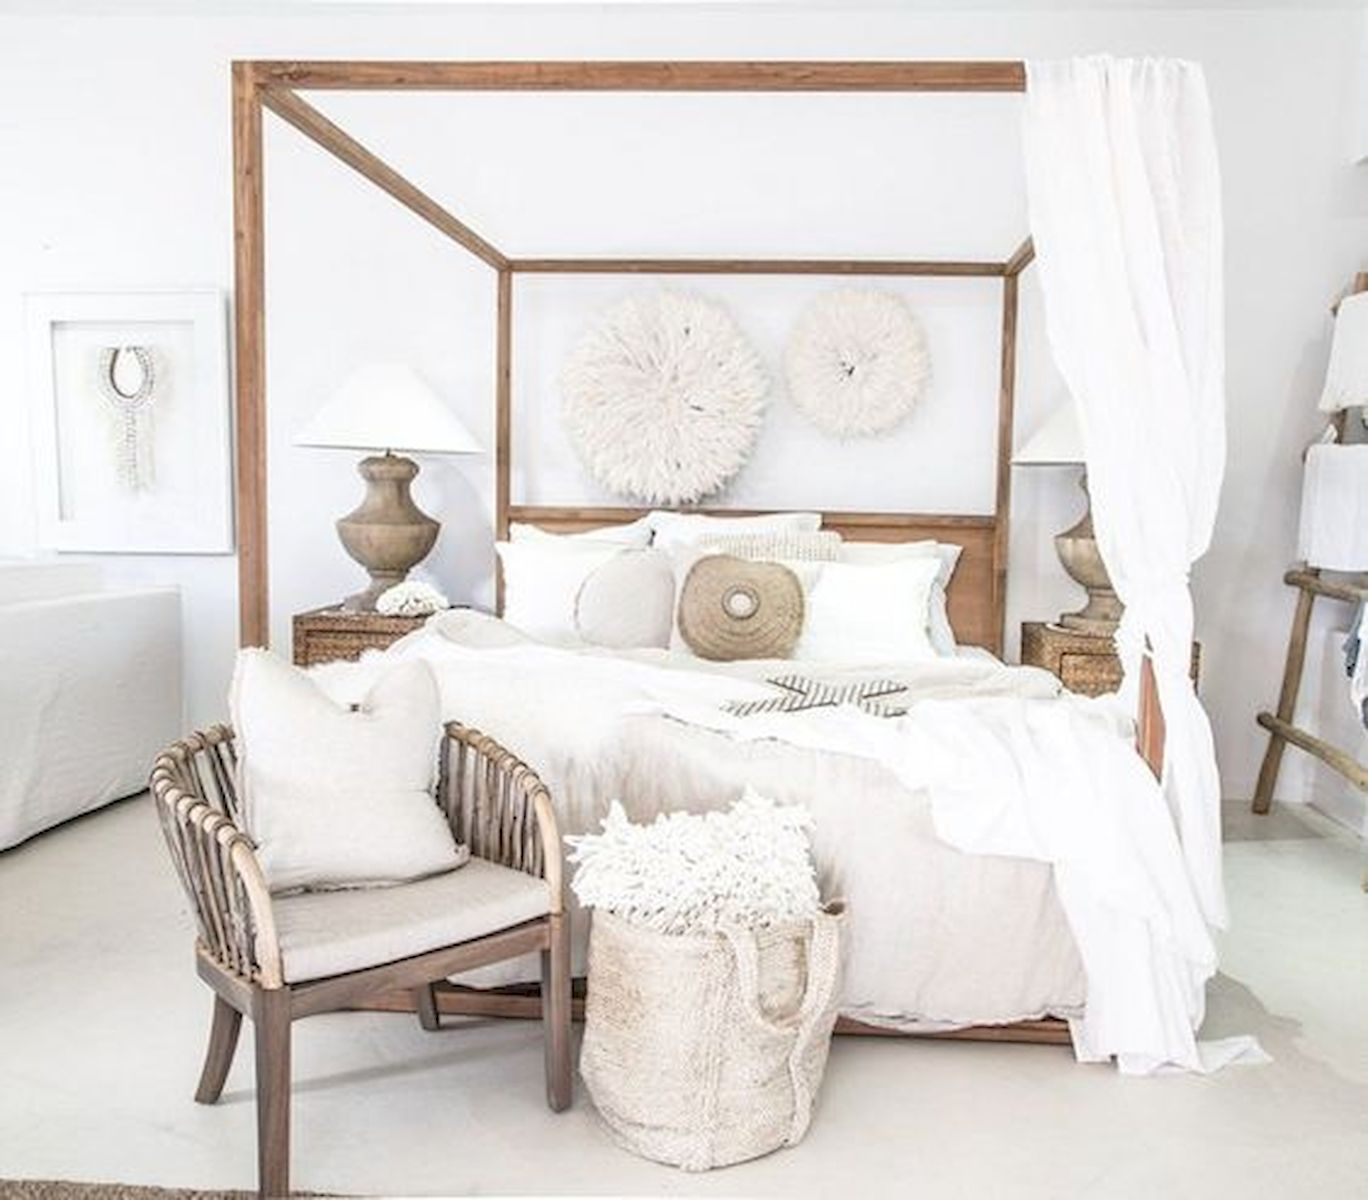 40 Fantastic DIY Decor Ideas For Farmhouse Boho Bedroom Design (21)